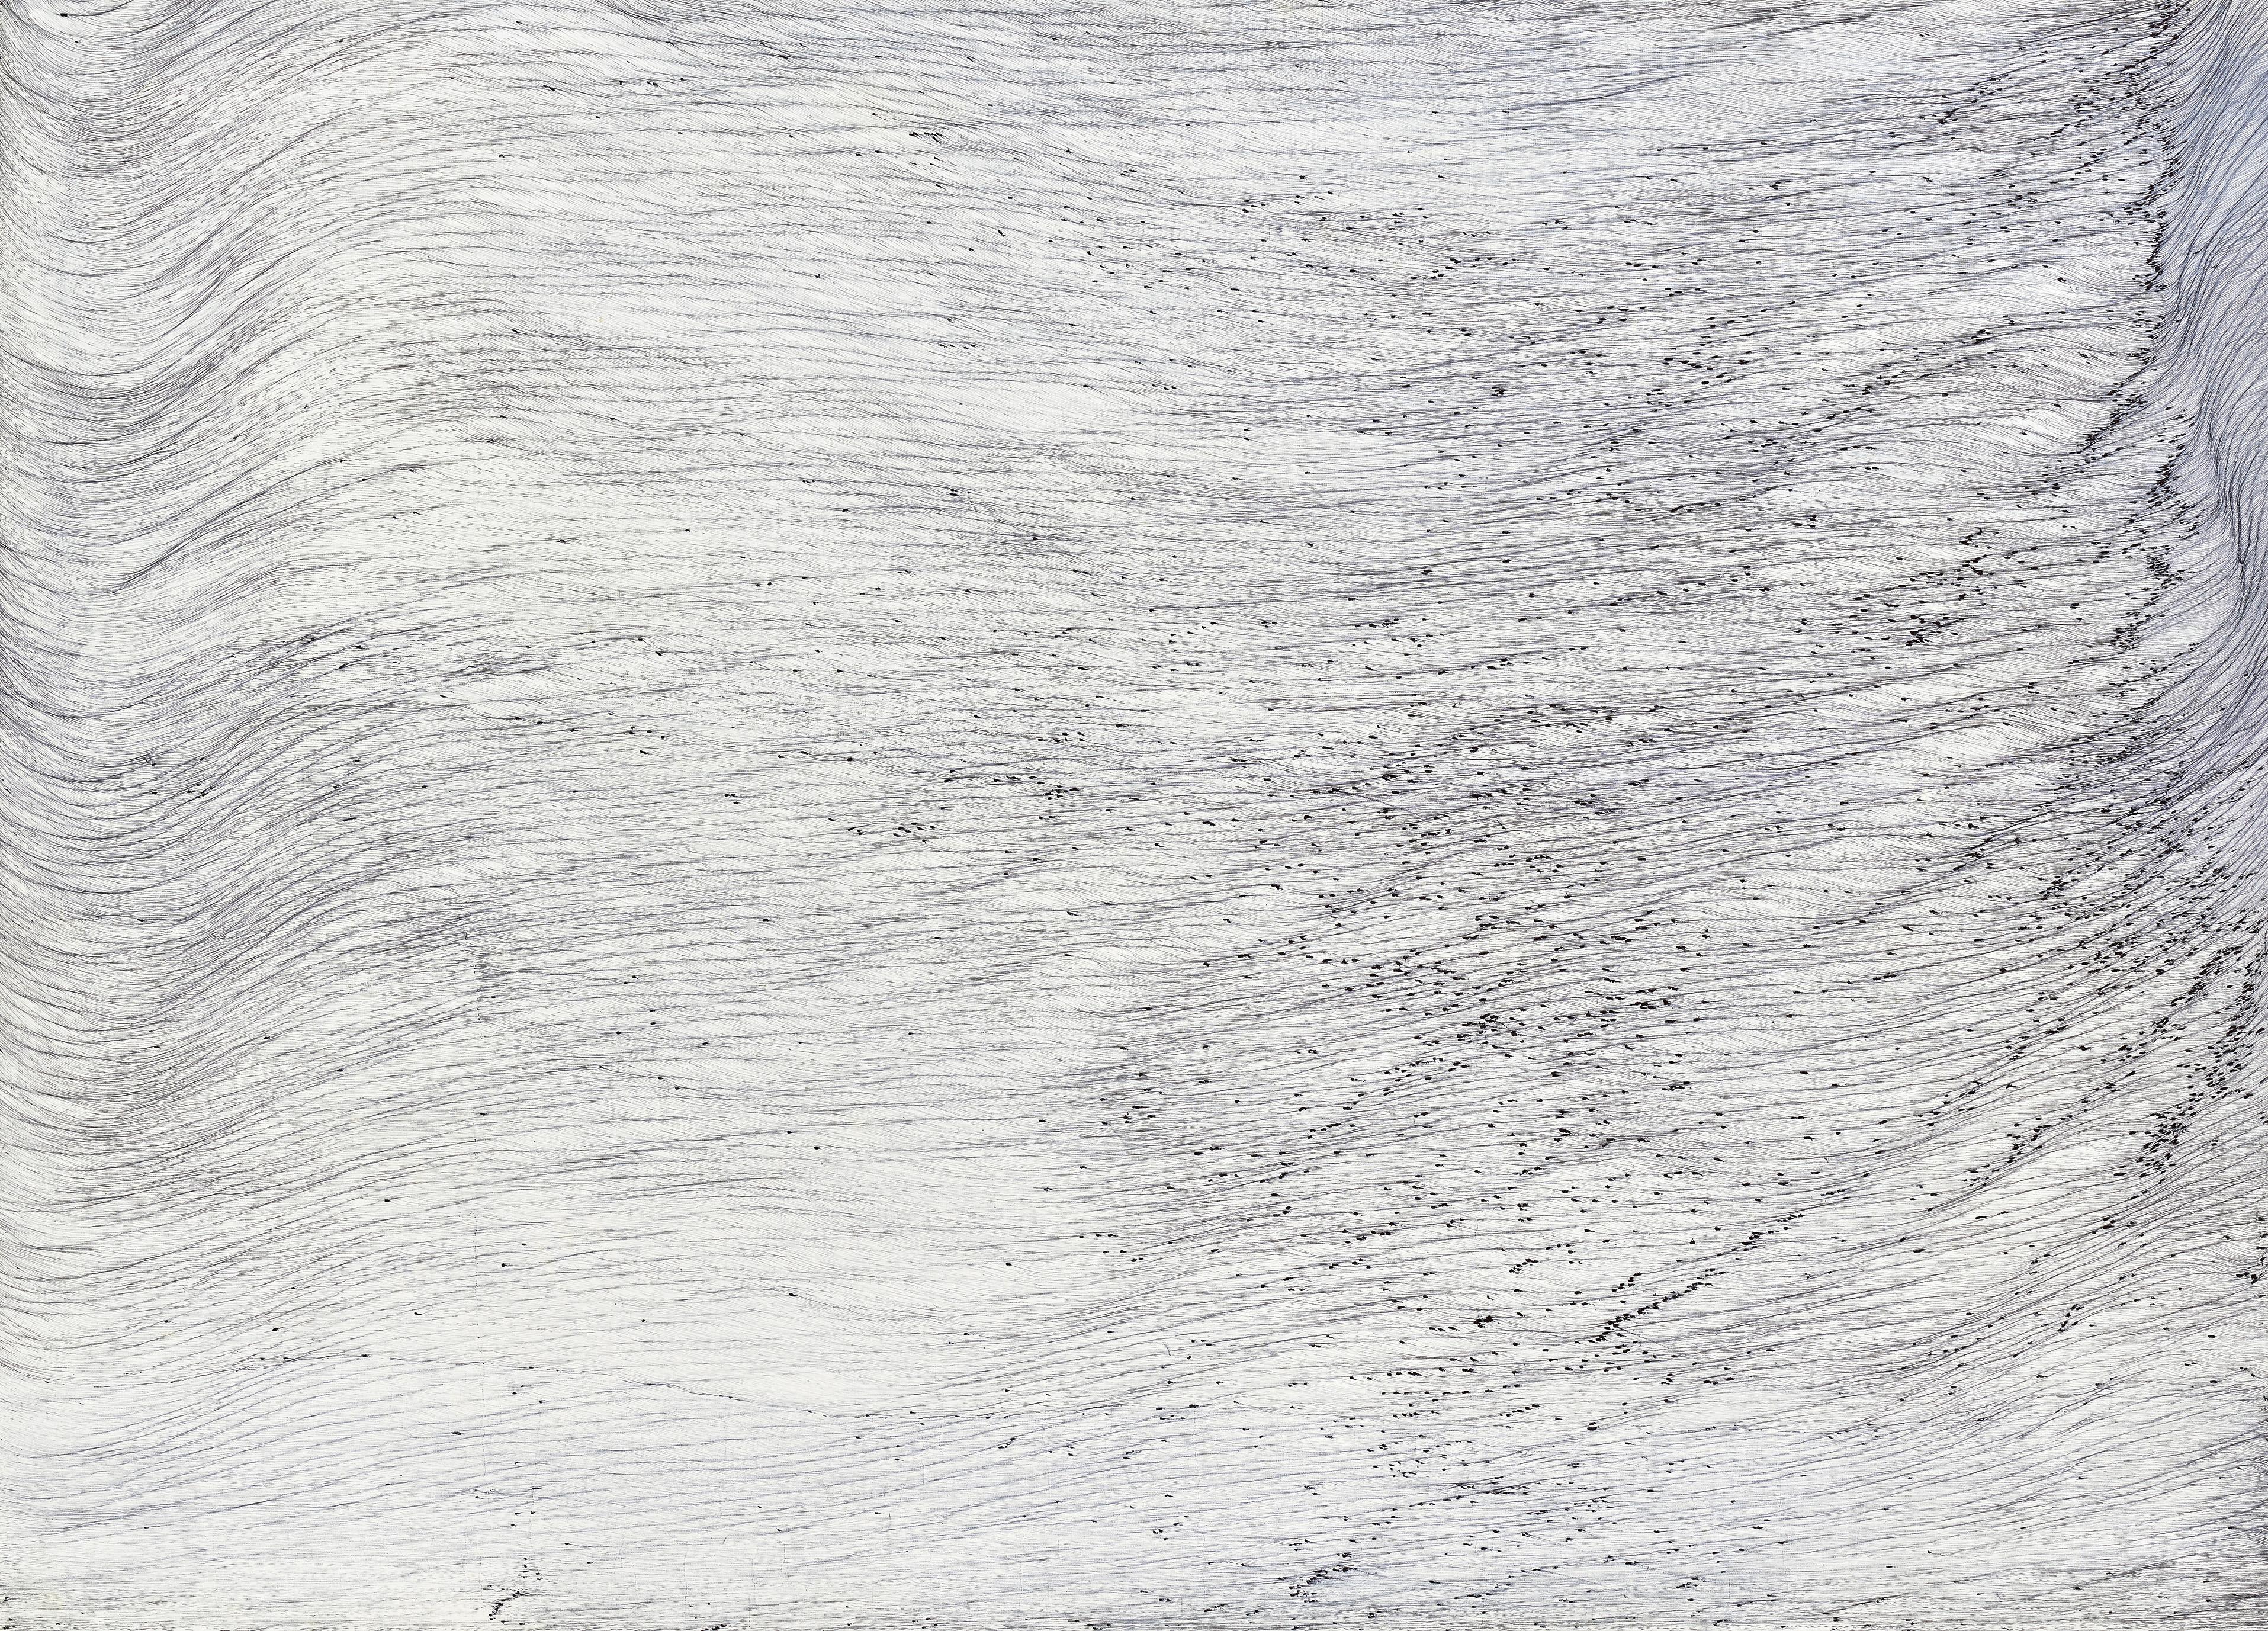 lightwave memory 14, ball pen on paper, 104 cm (height) x 144 cm (width), 2016